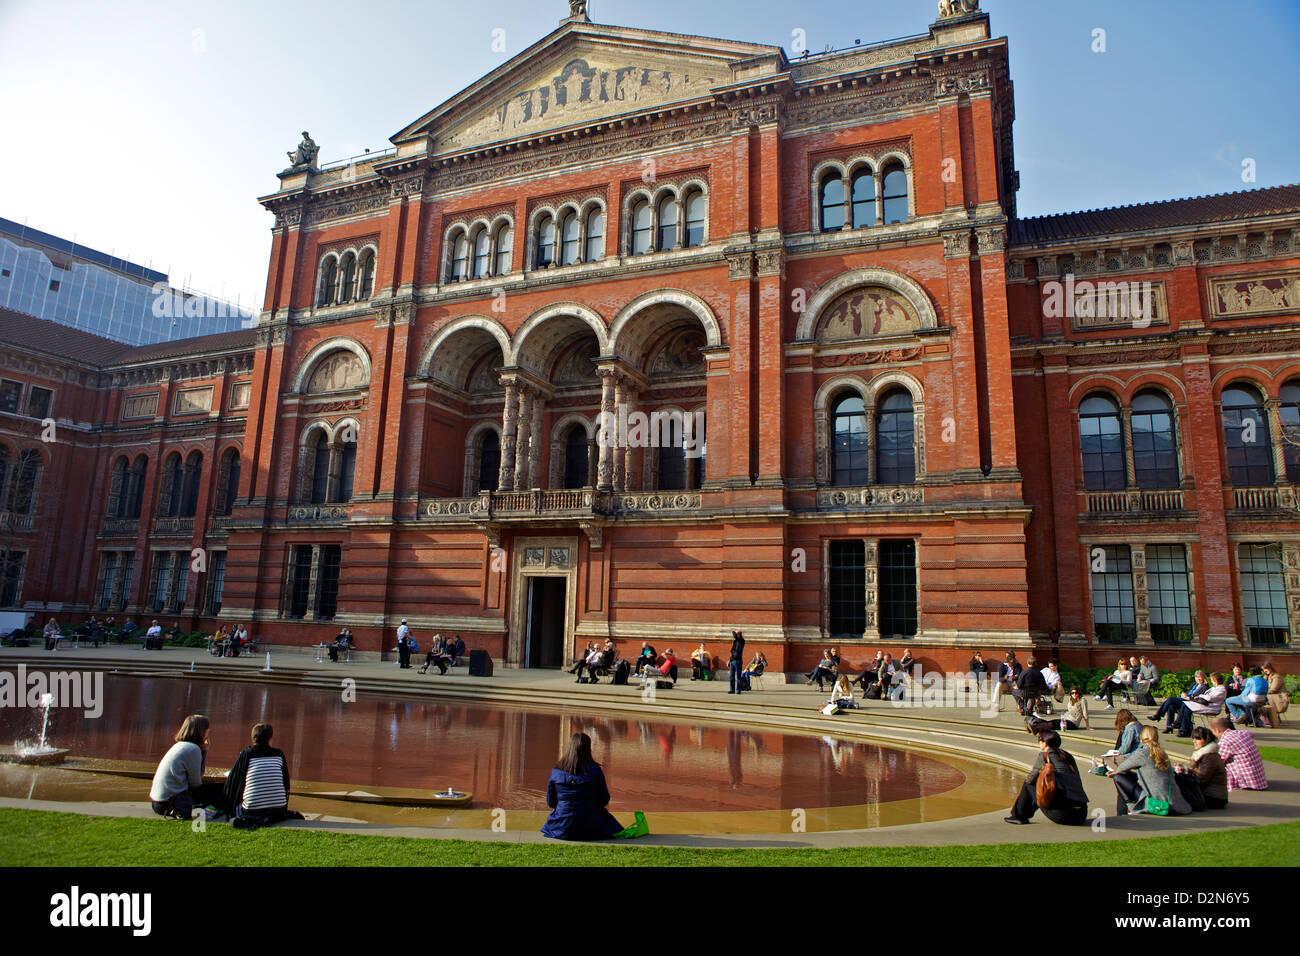 John Madejski Garden, Victoria and Albert Museum, South Kensington, London, England, United Kingdom, Europe - Stock Image